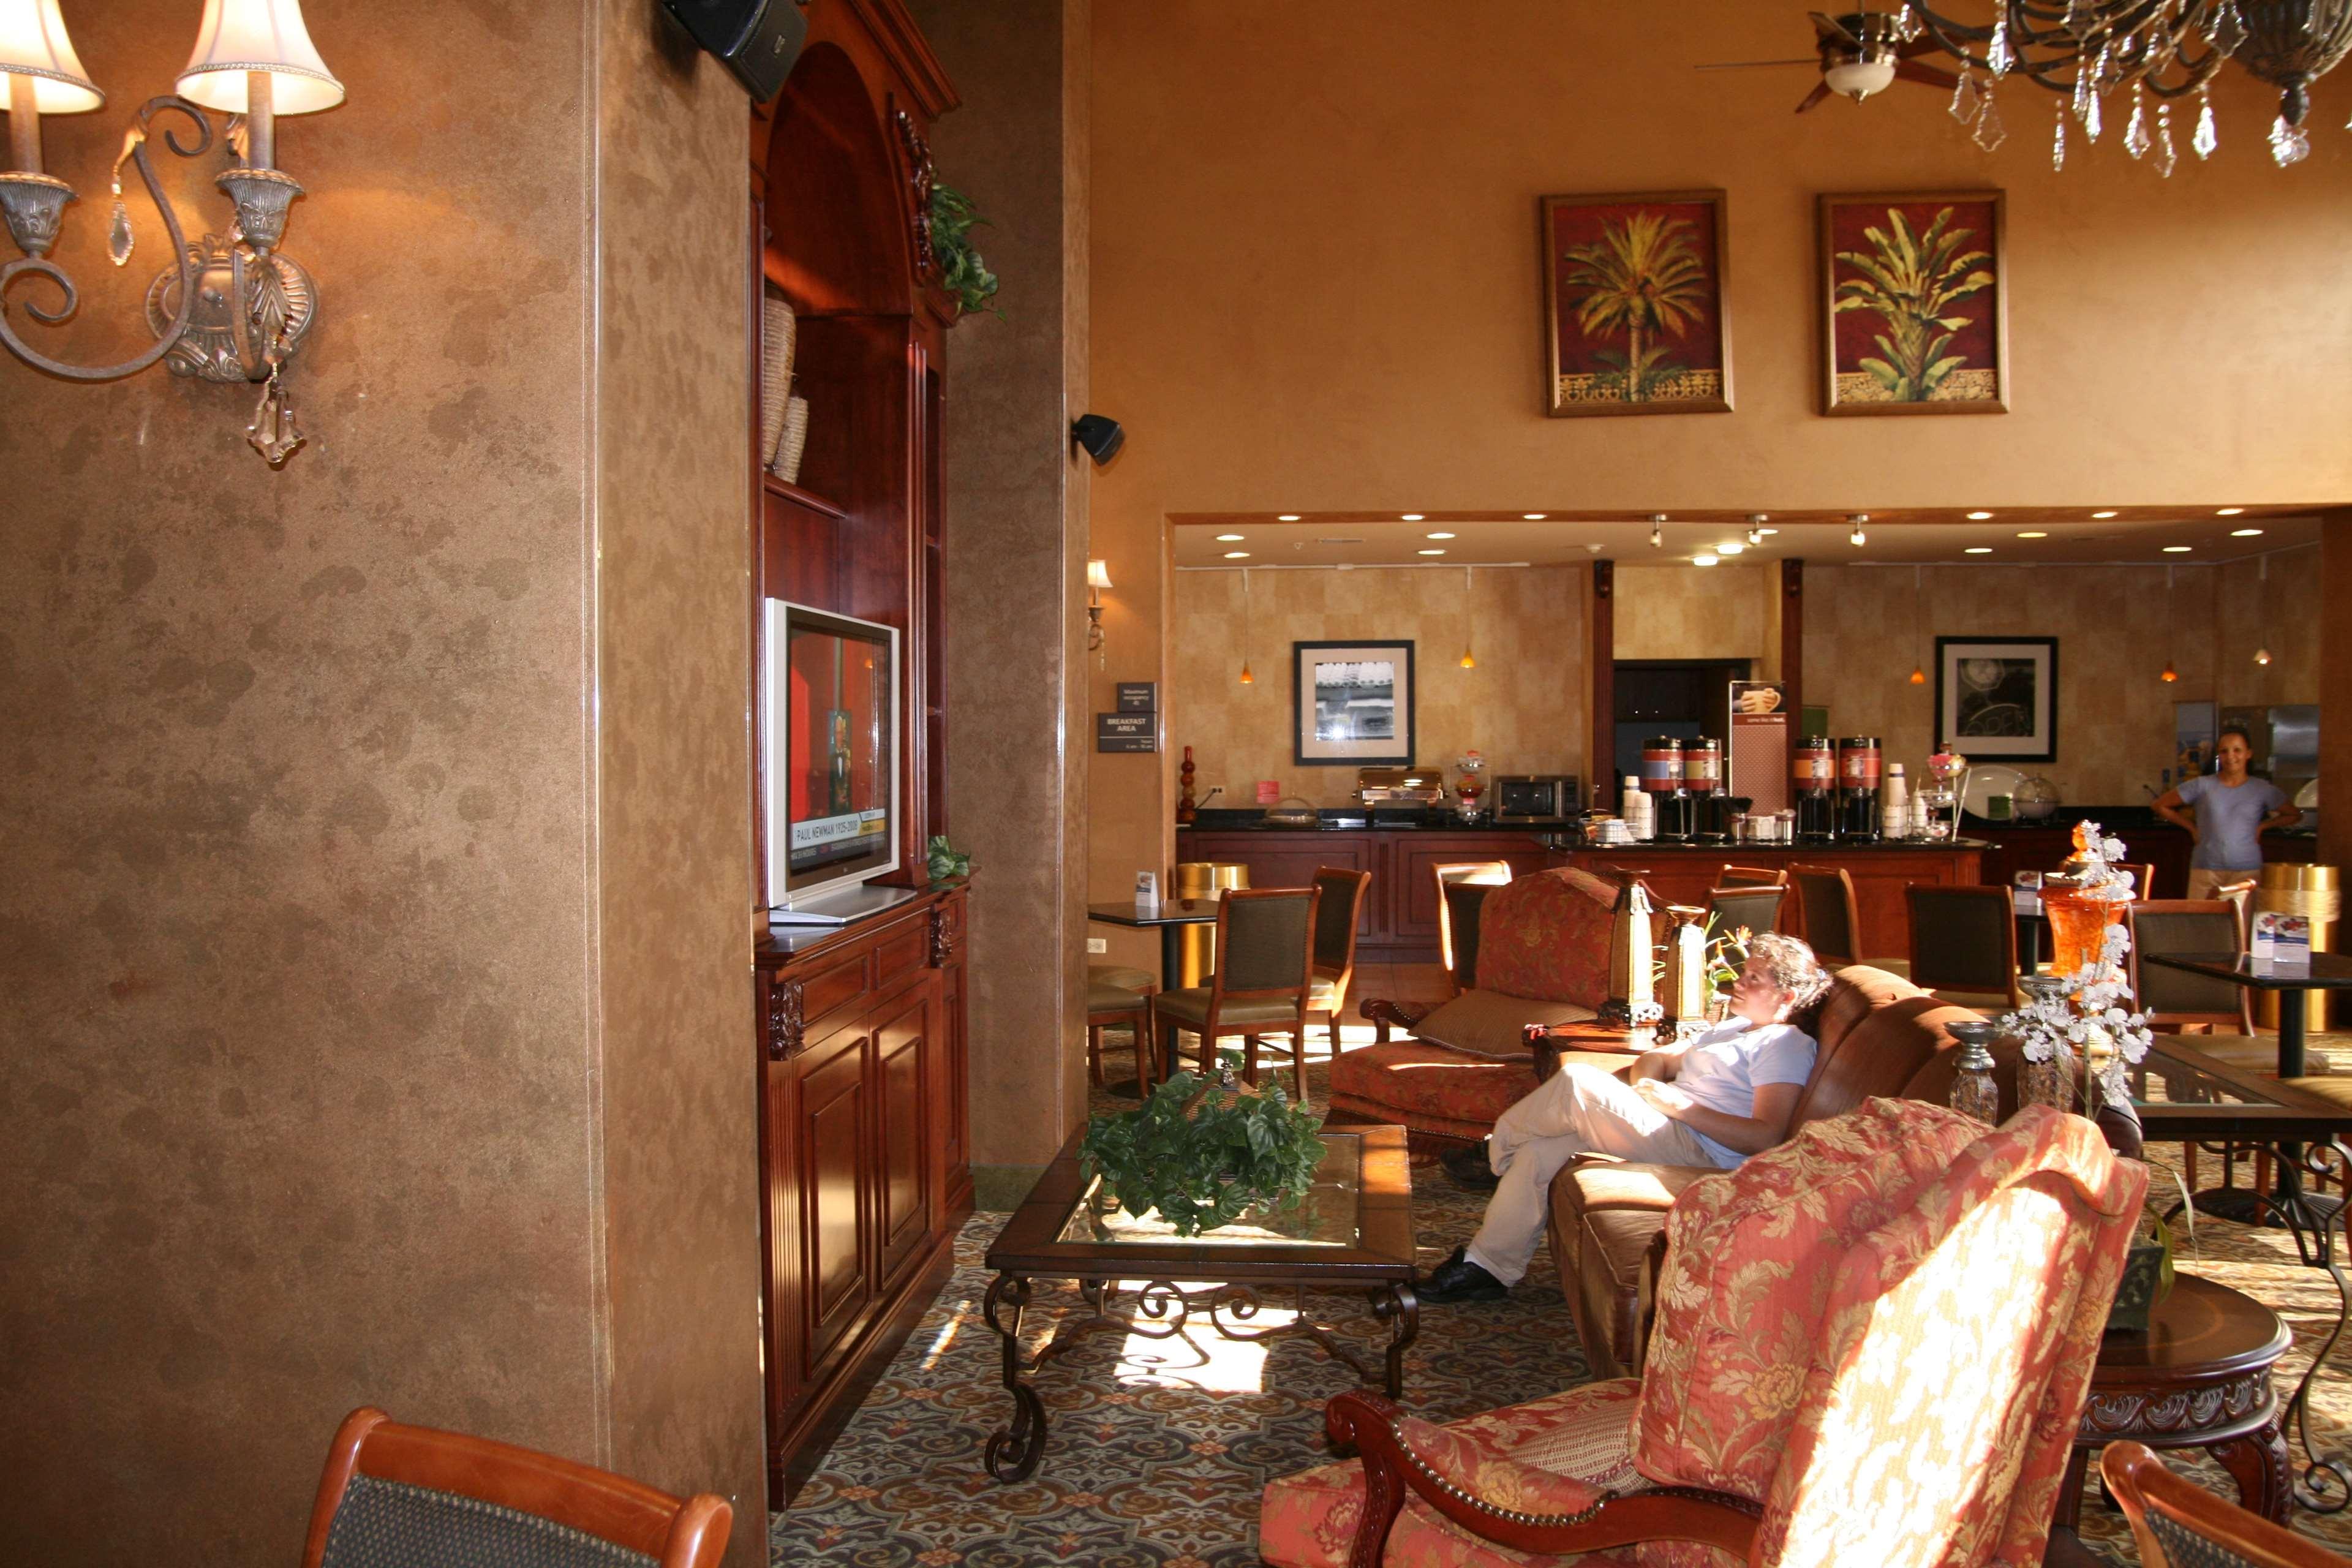 Hampton Inn & Suites Bolingbrook image 3